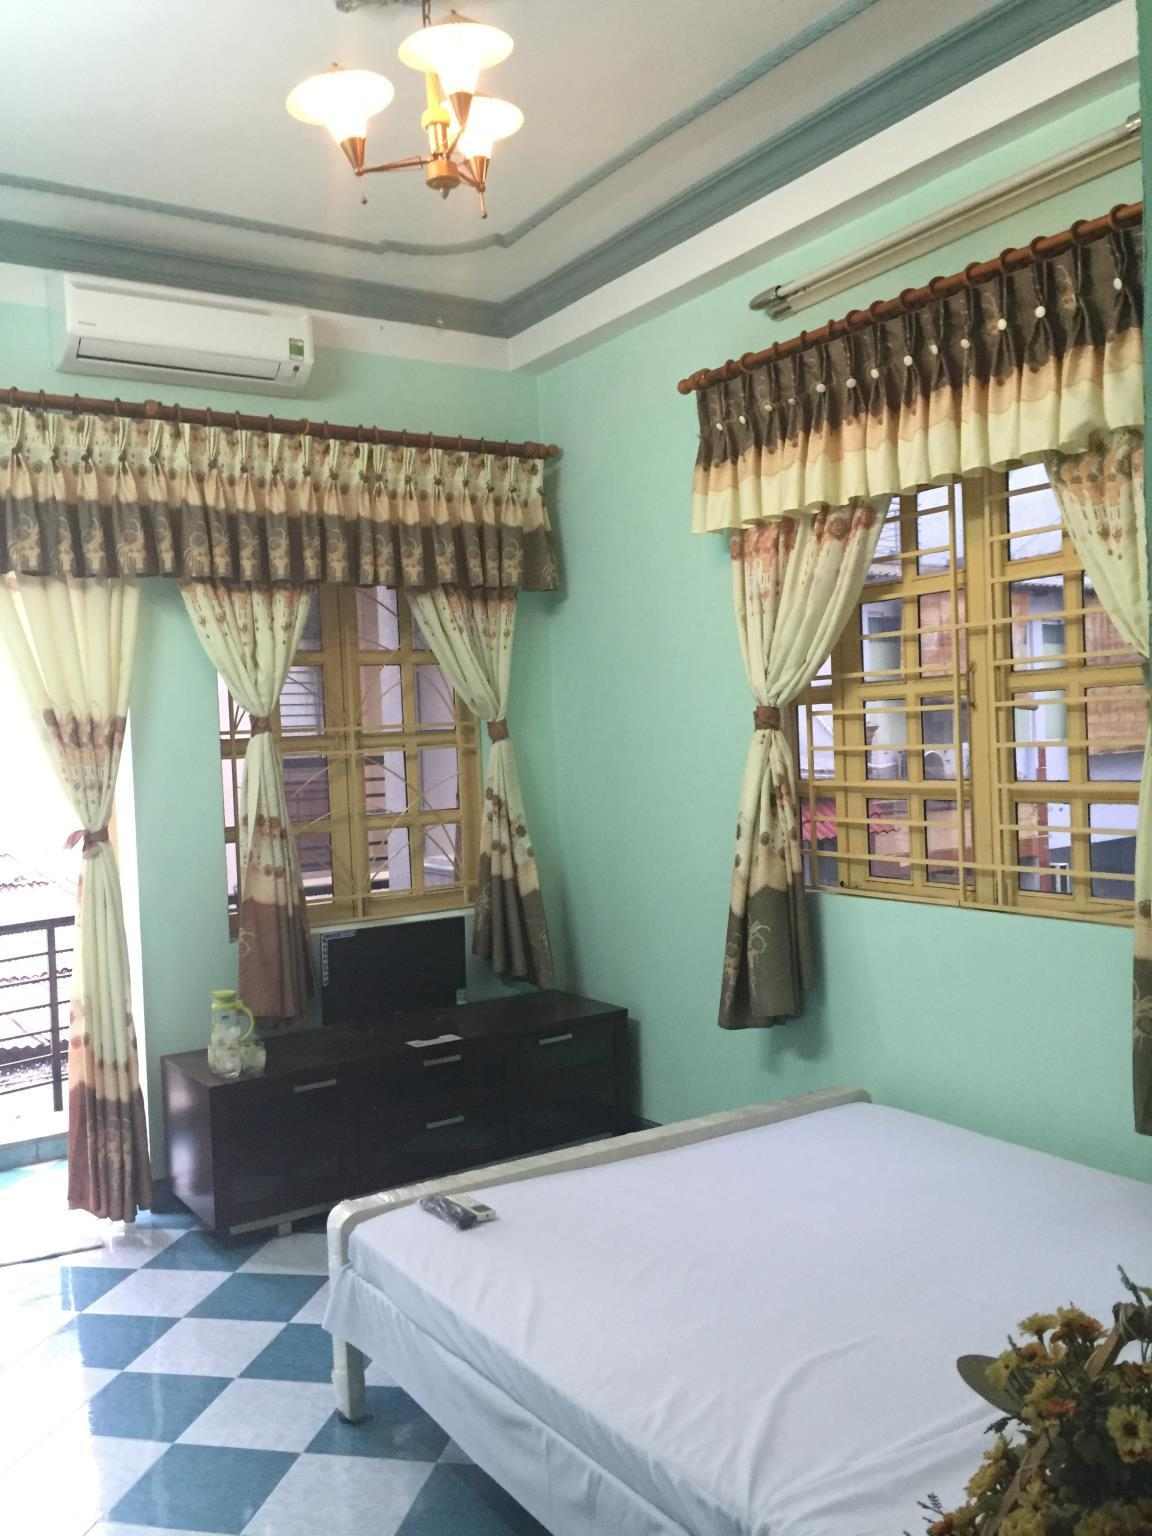 House's Co Ho Chi Minh City Vietnam